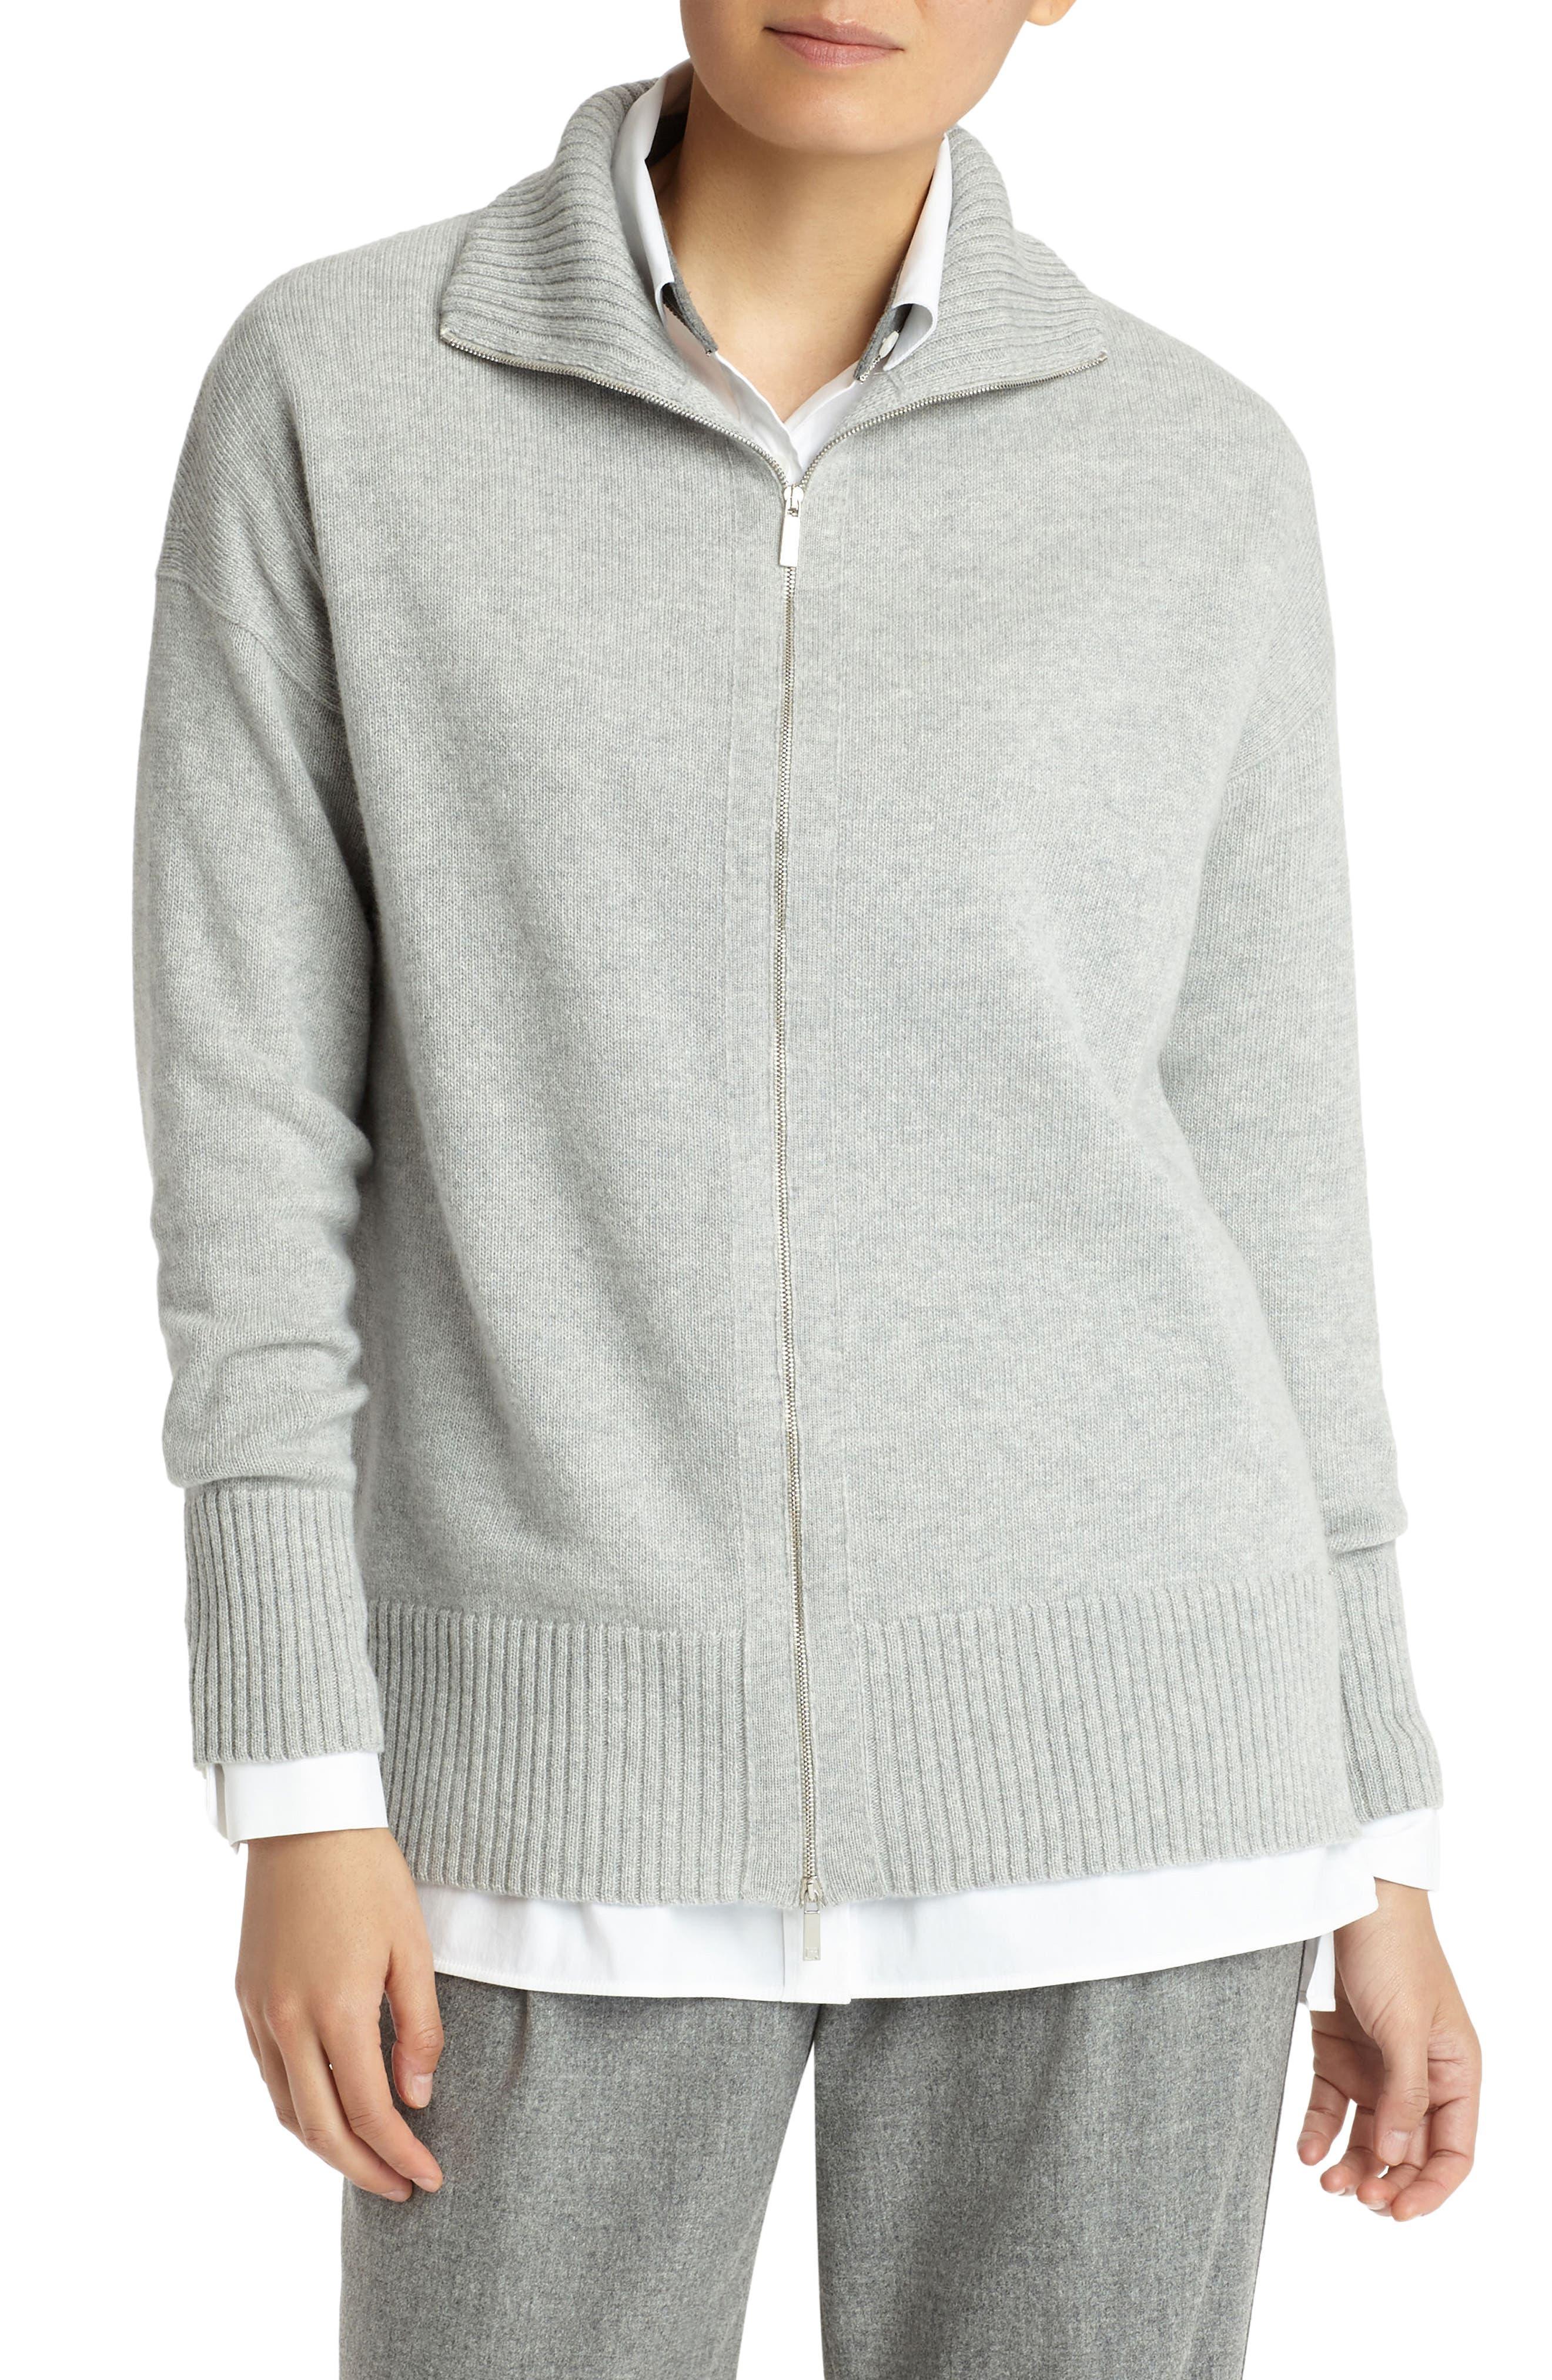 Alternate Image 1 Selected - Lafayette 148 New York Luxe Merino Wool & Cashmere Sweater Jacket